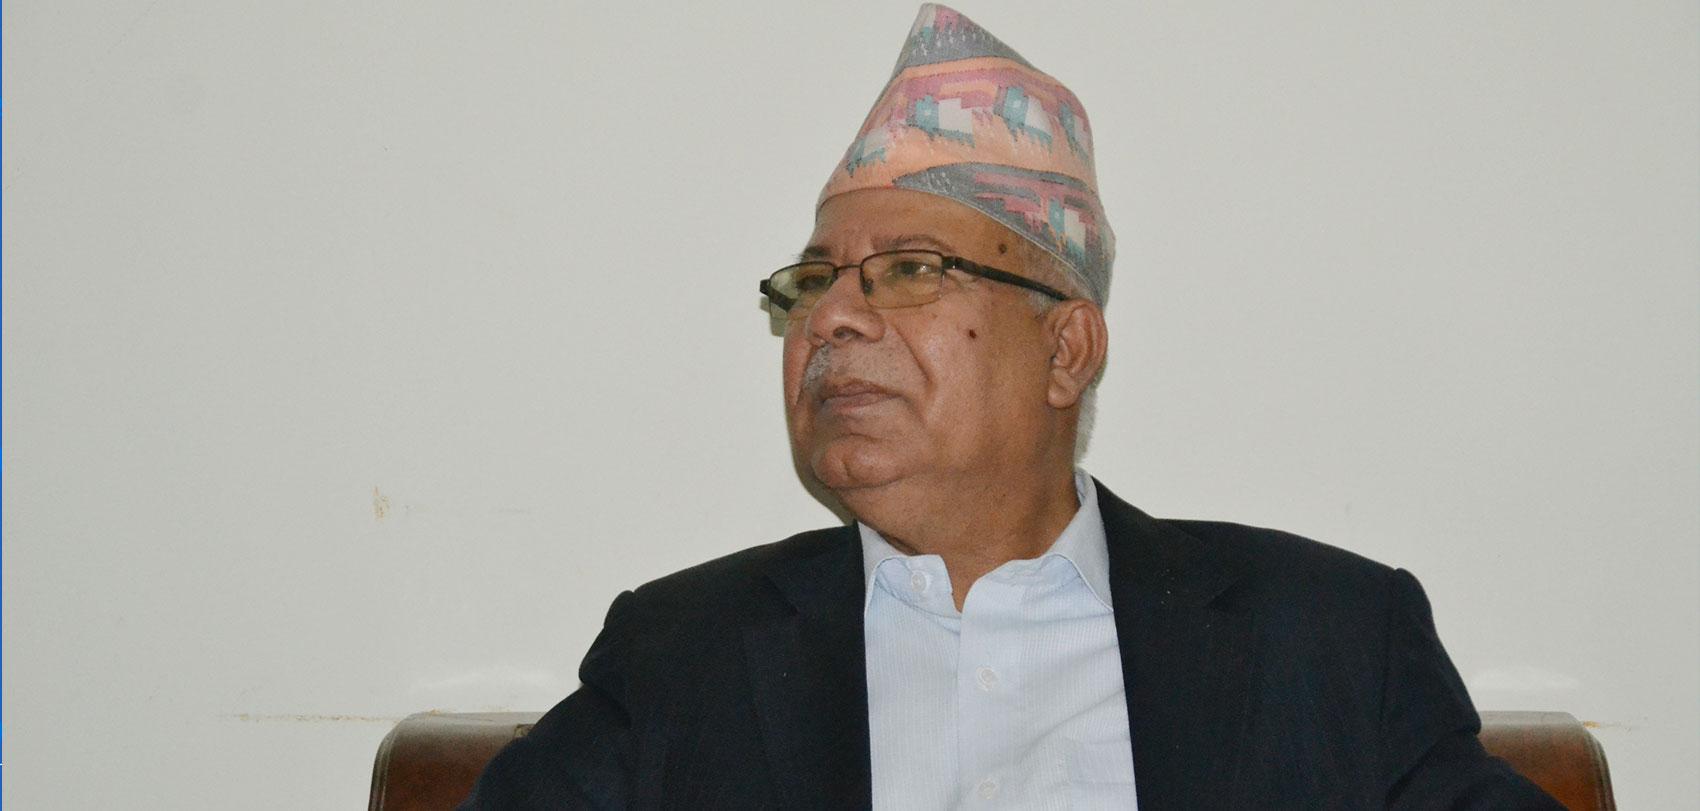 म नै सर्वेसर्वा हुँ भन्ने प्रवृत्तिविरुद्ध दृढतापूर्वक उभियौं : माधव नेपाल